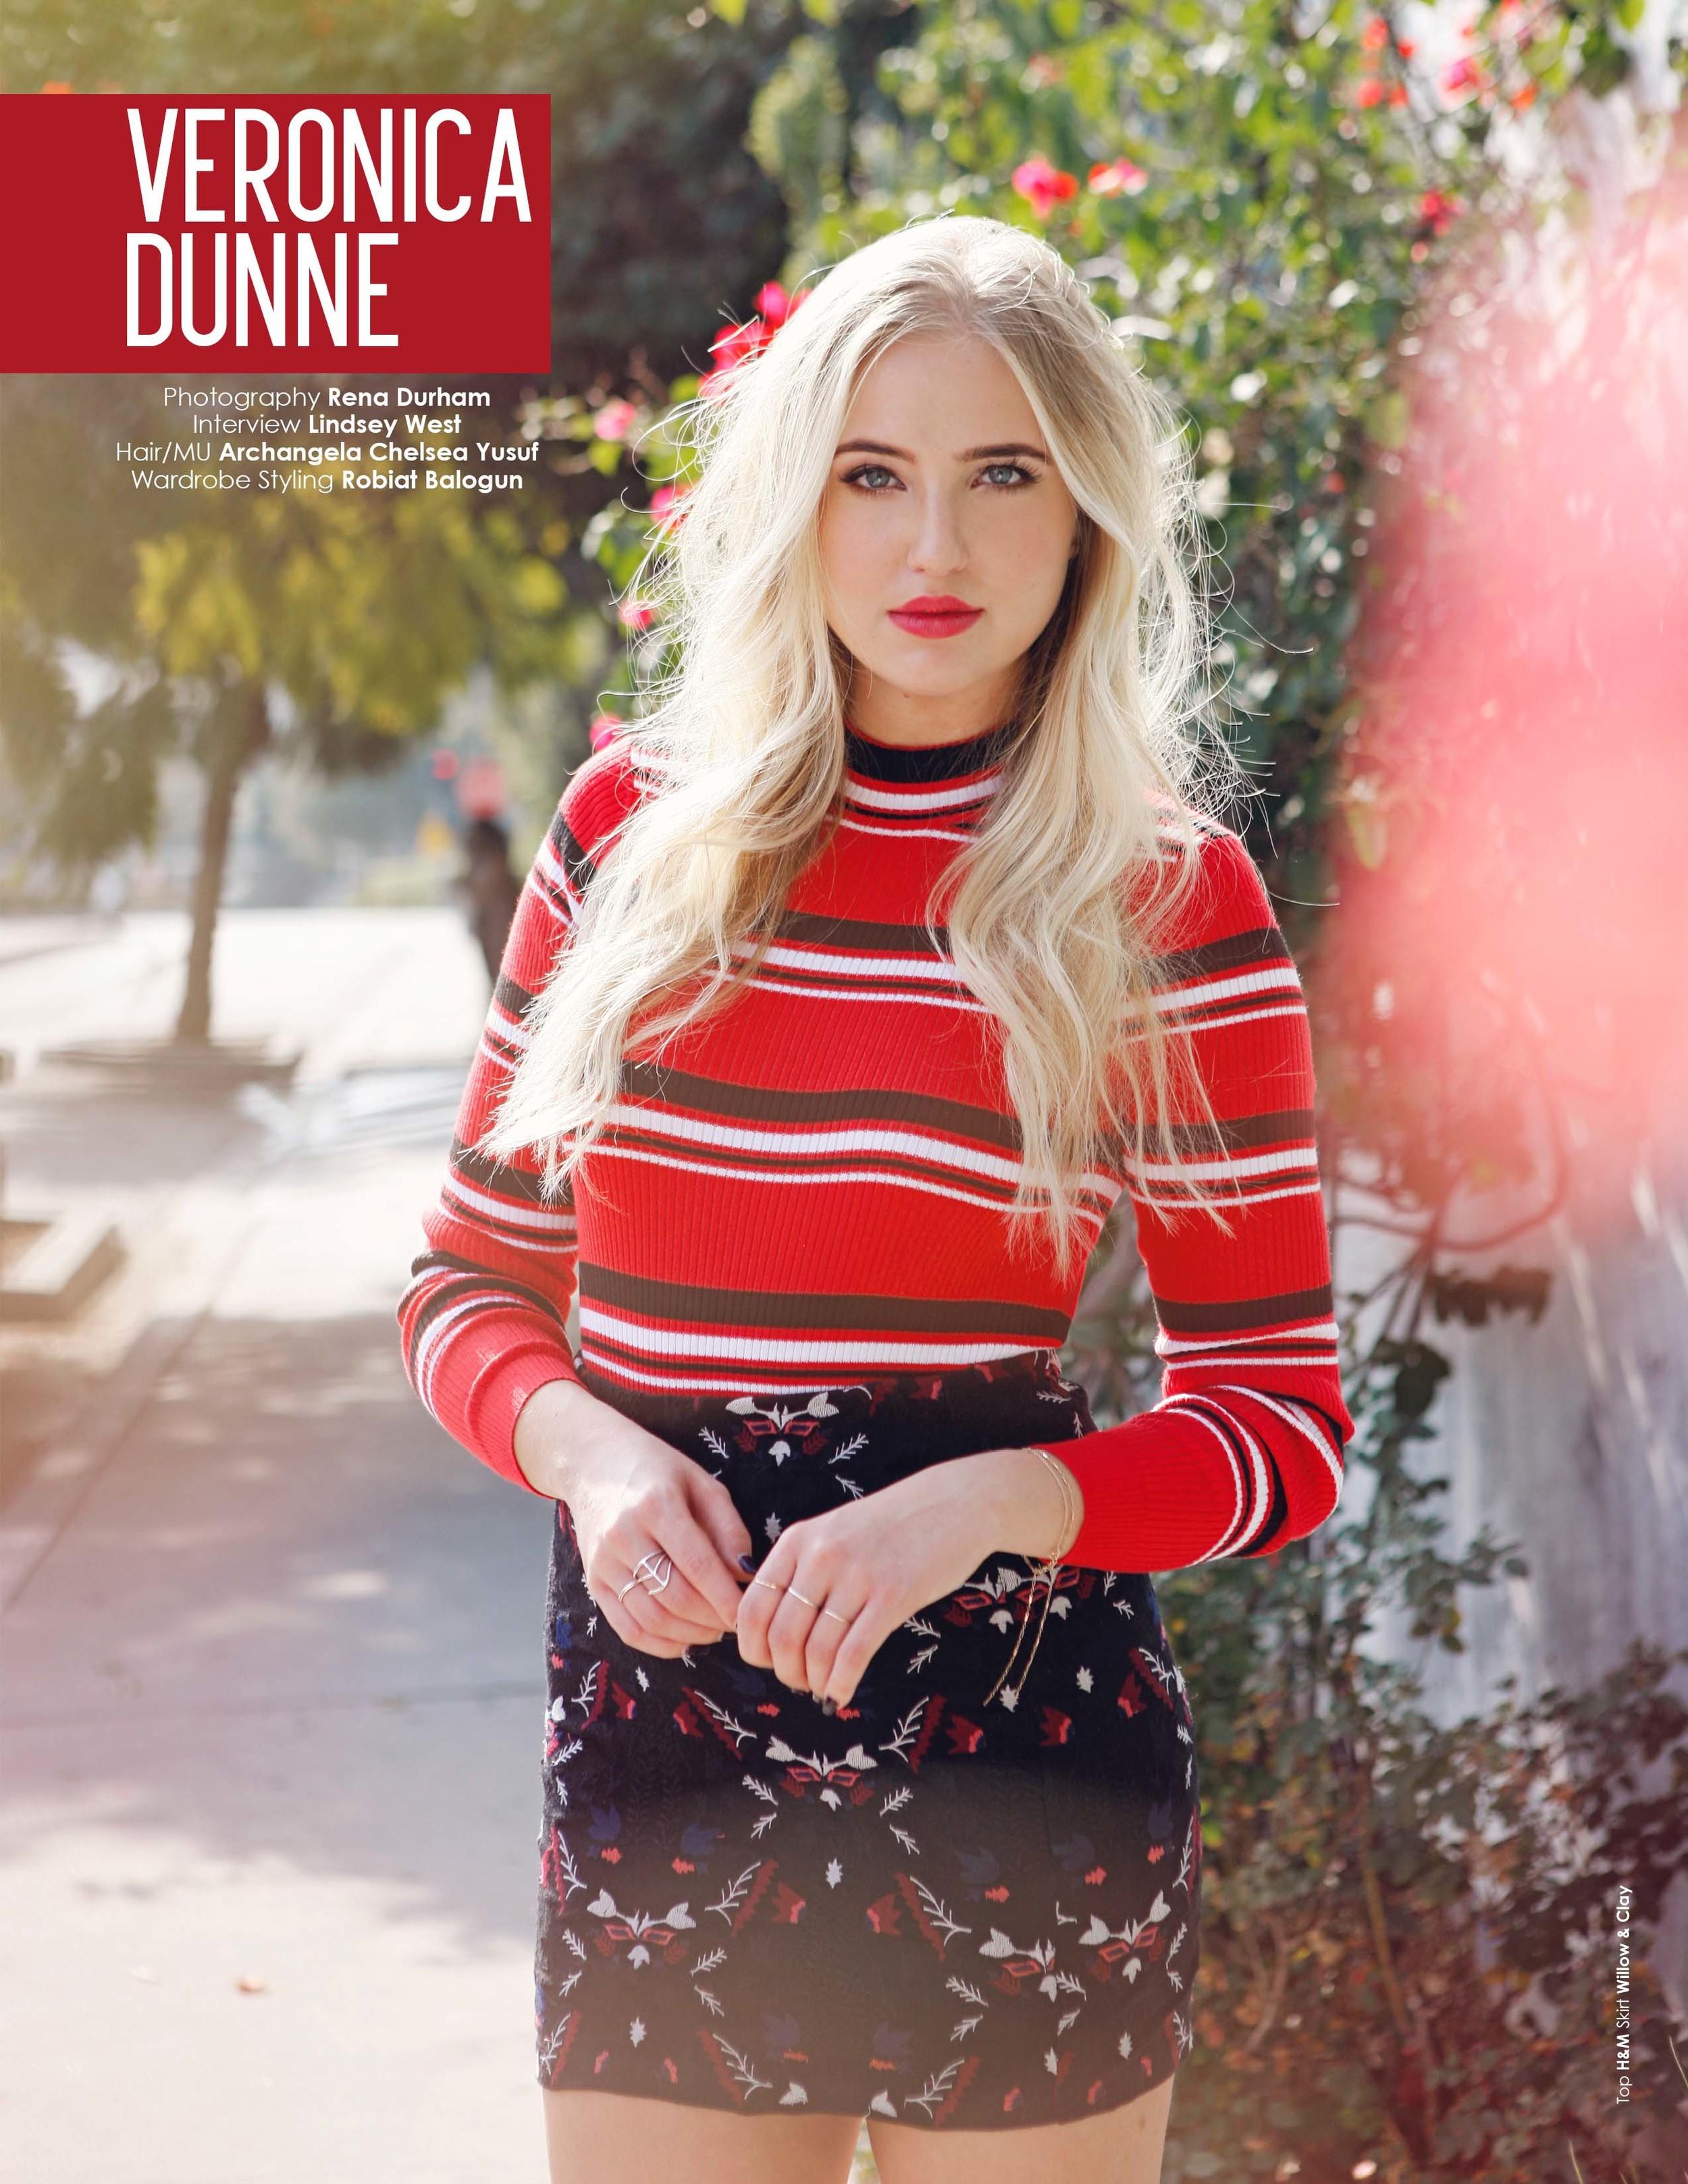 Veronica Dunne